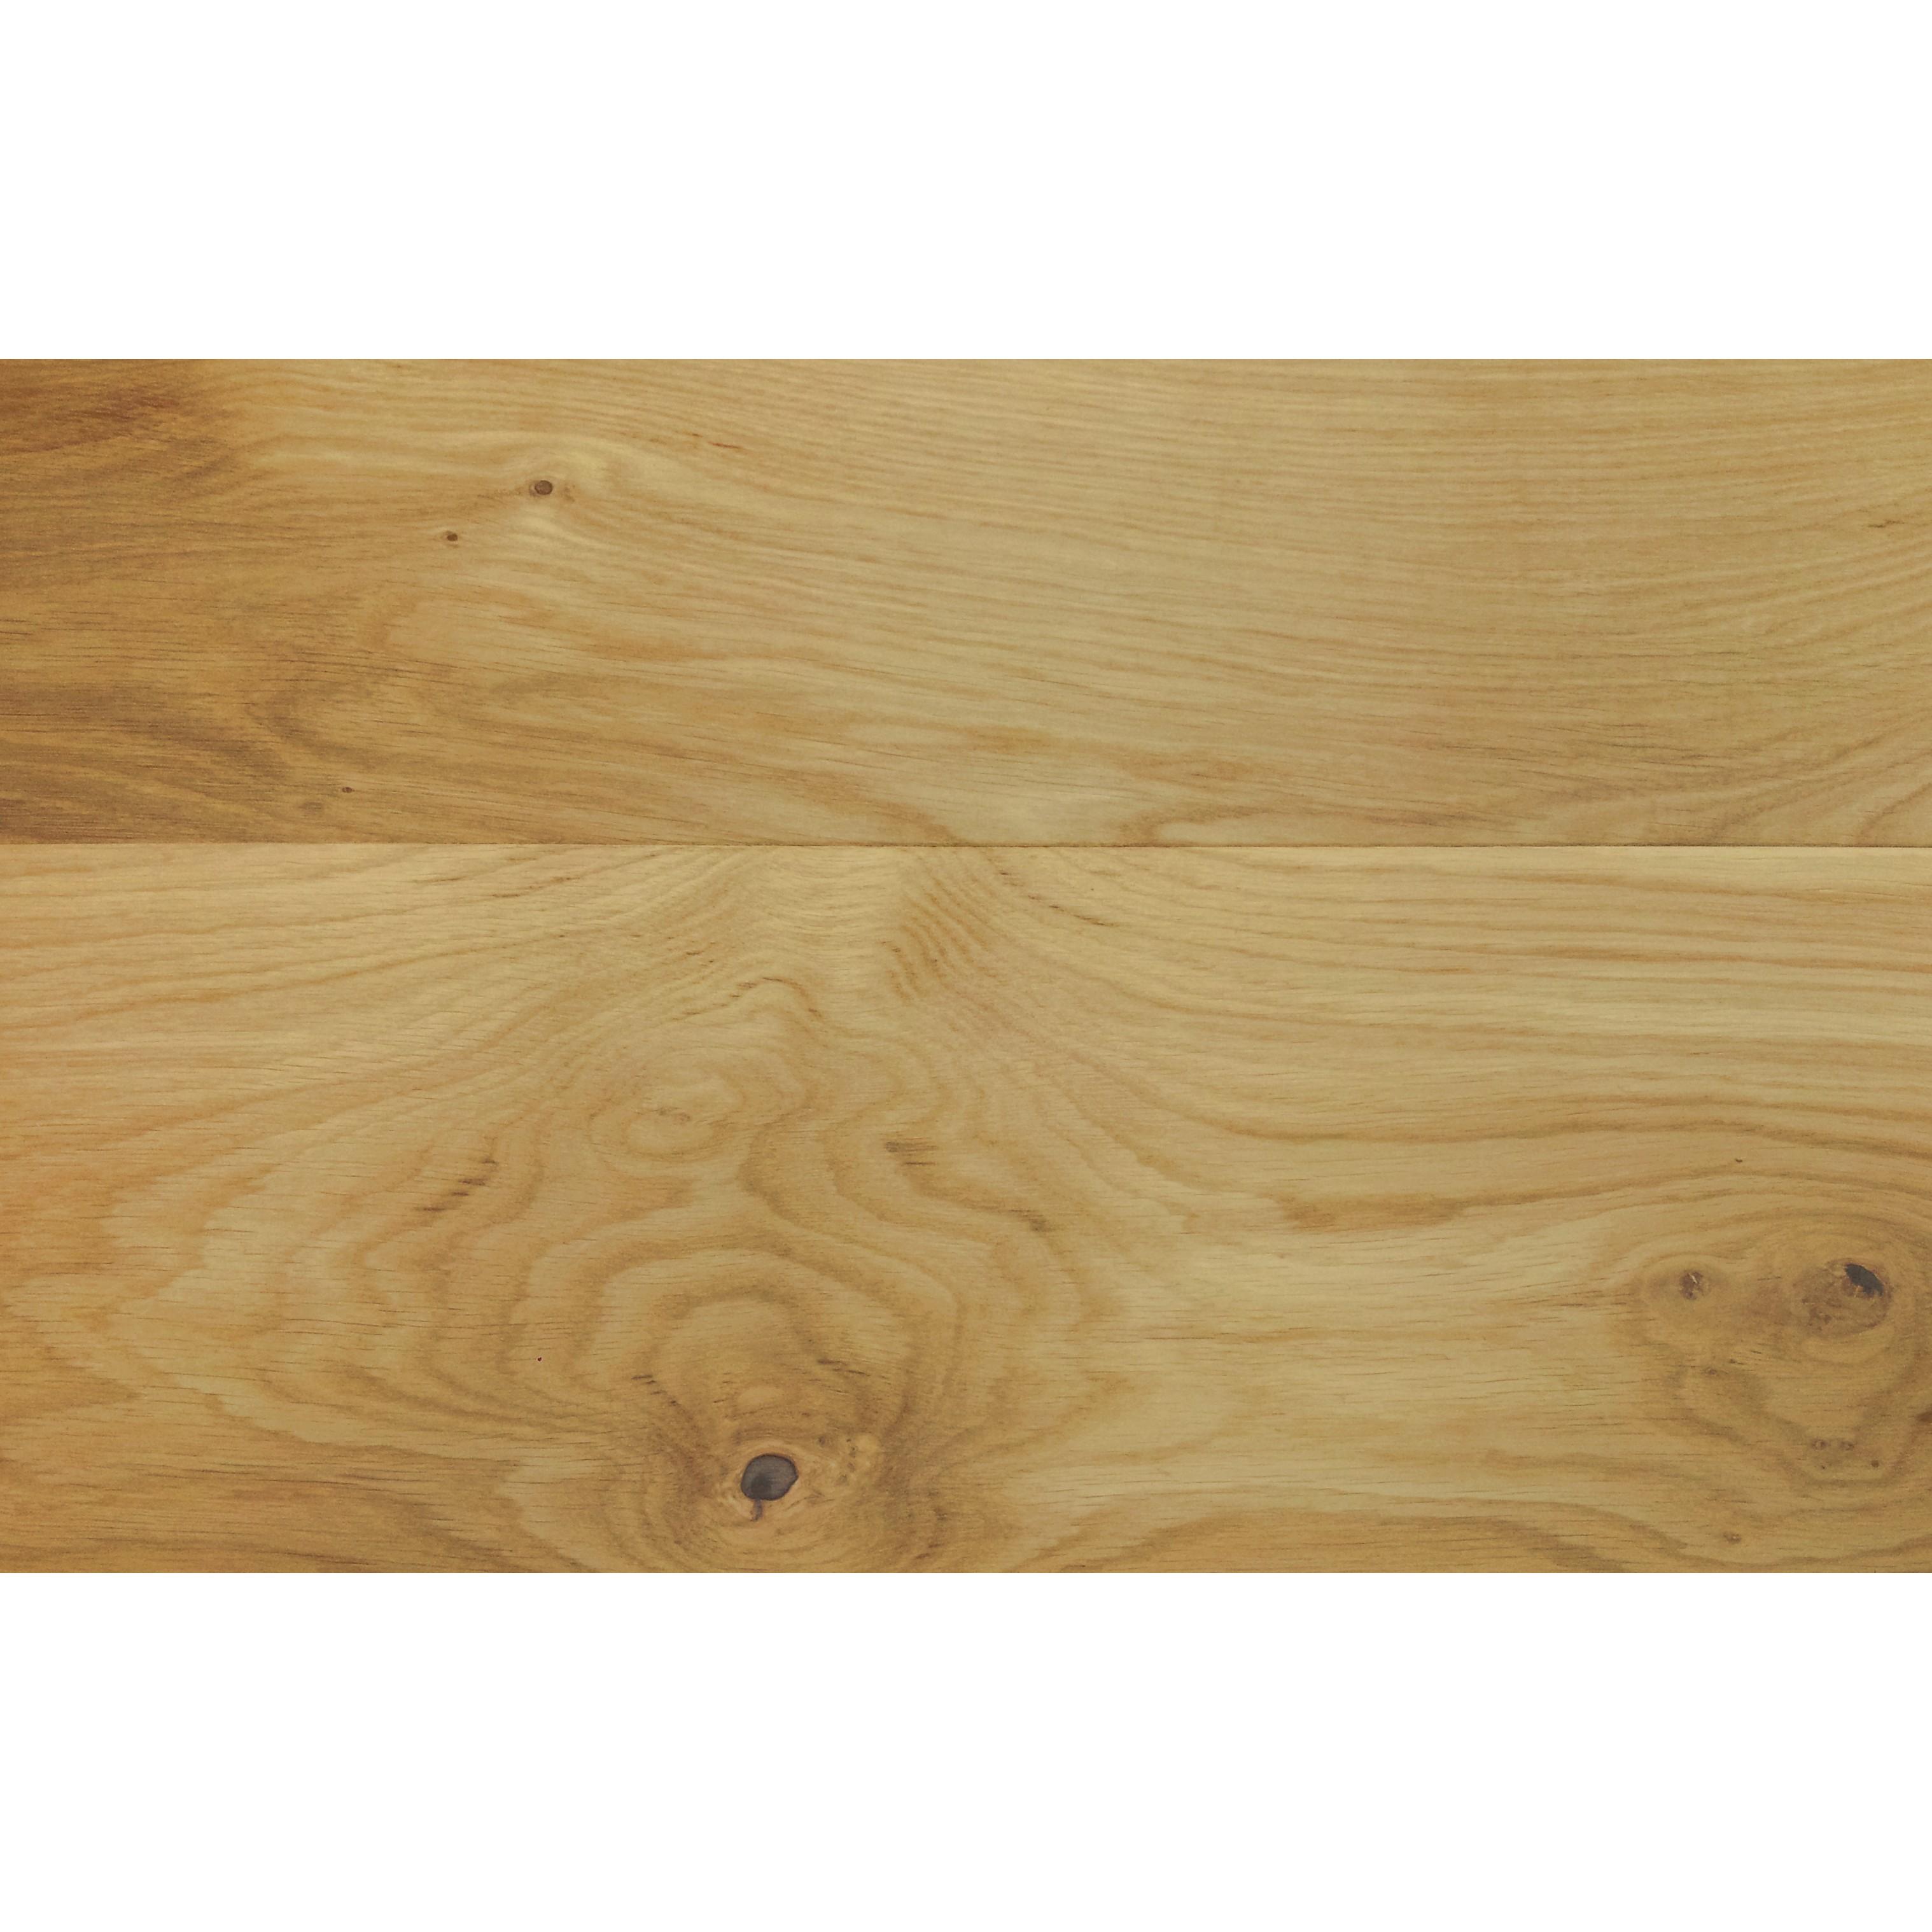 Artisan Engineered European Oak Natural Classic